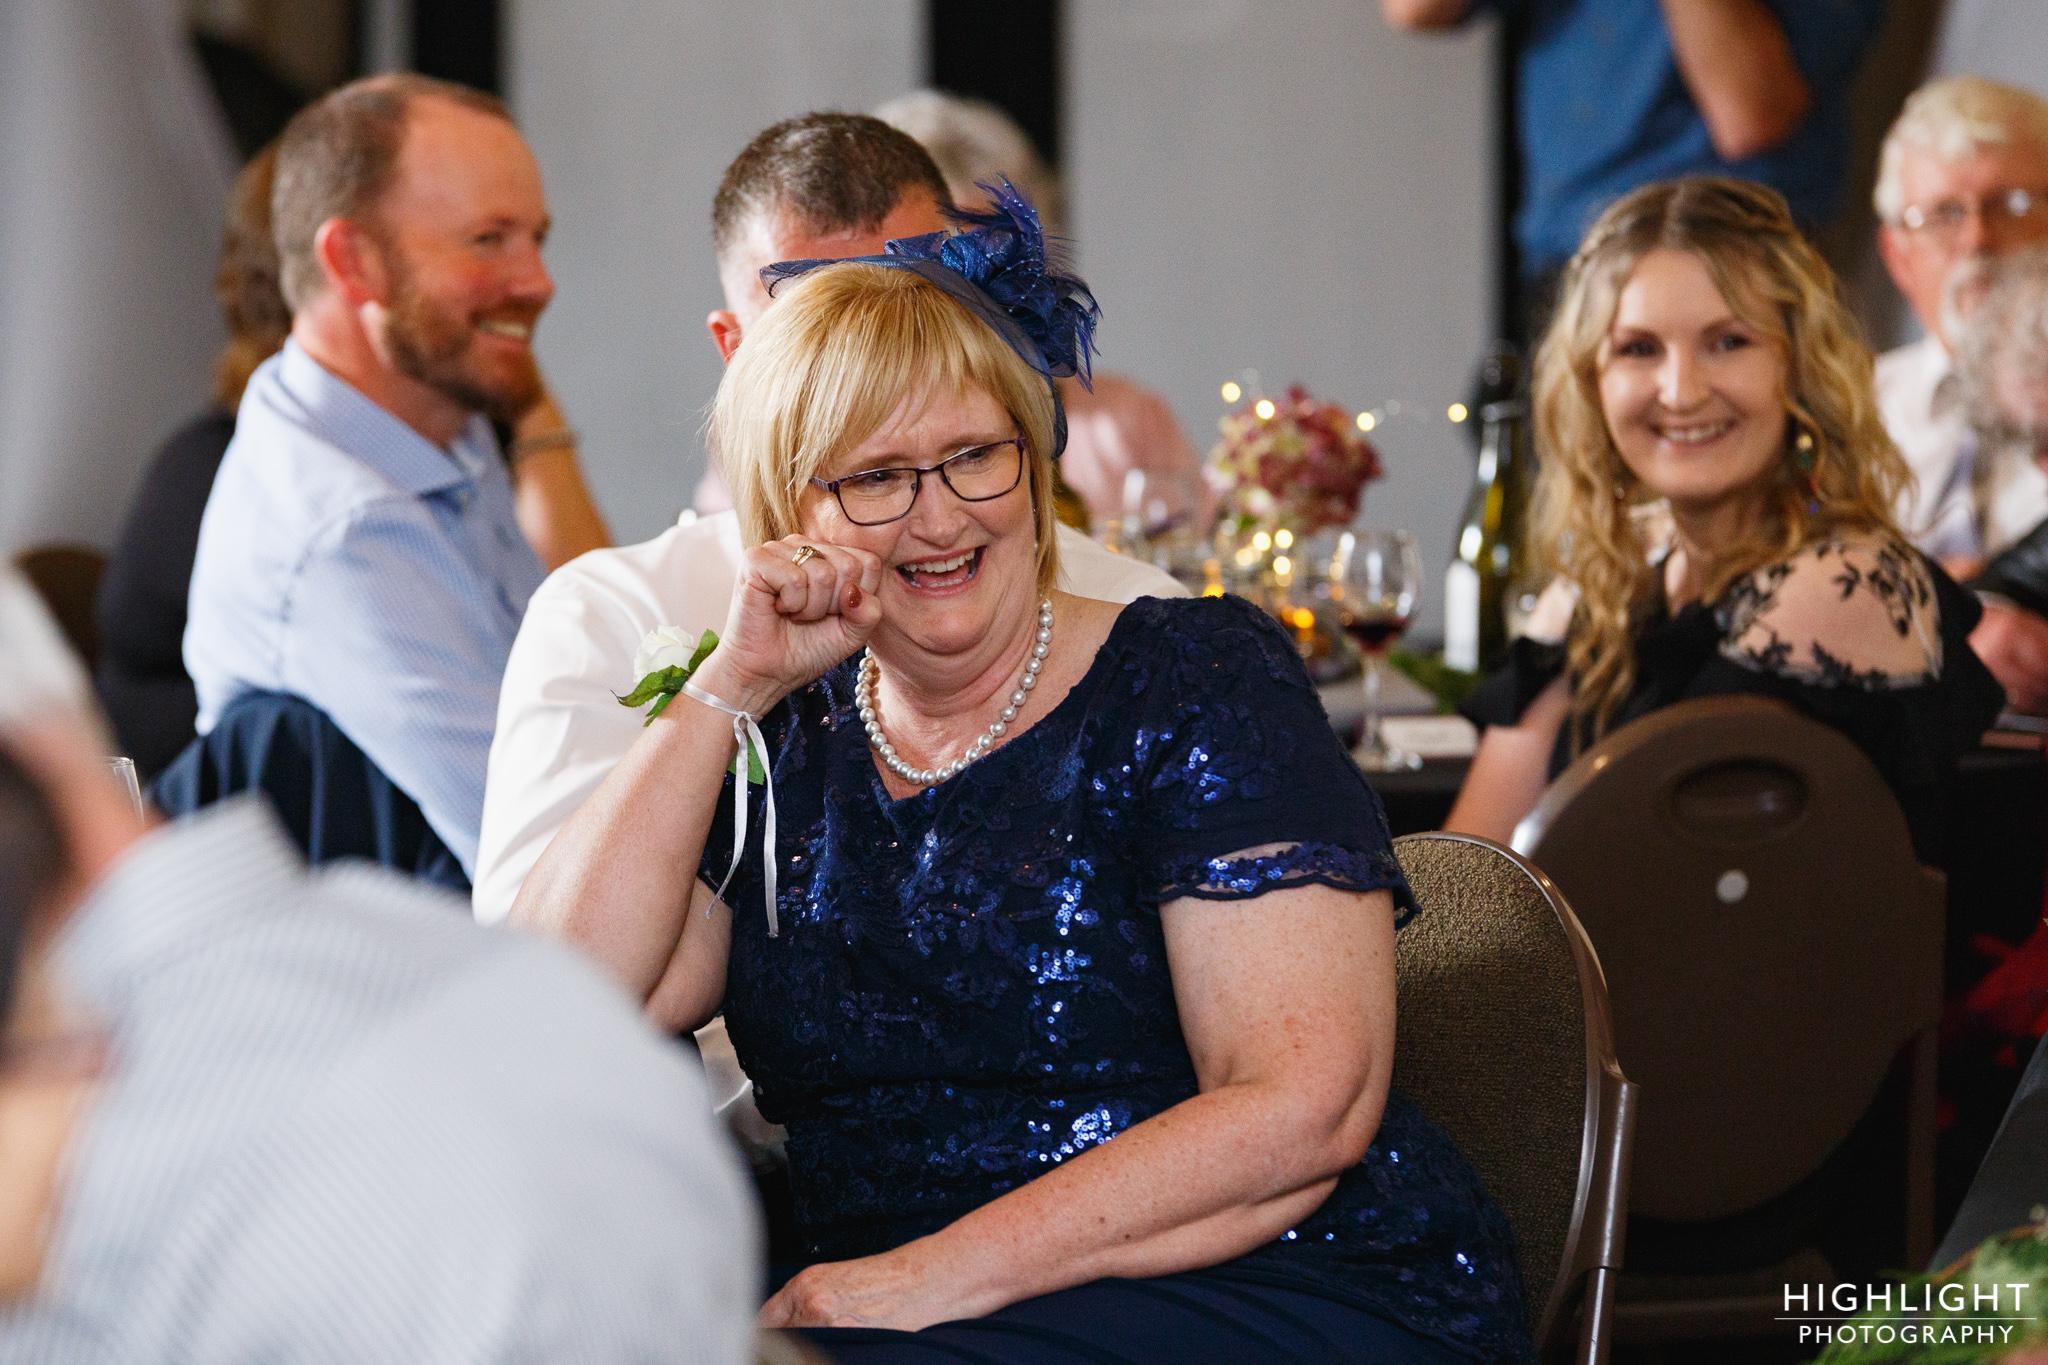 highlight-wedding-photography-feilding-new-zealand-192.jpg